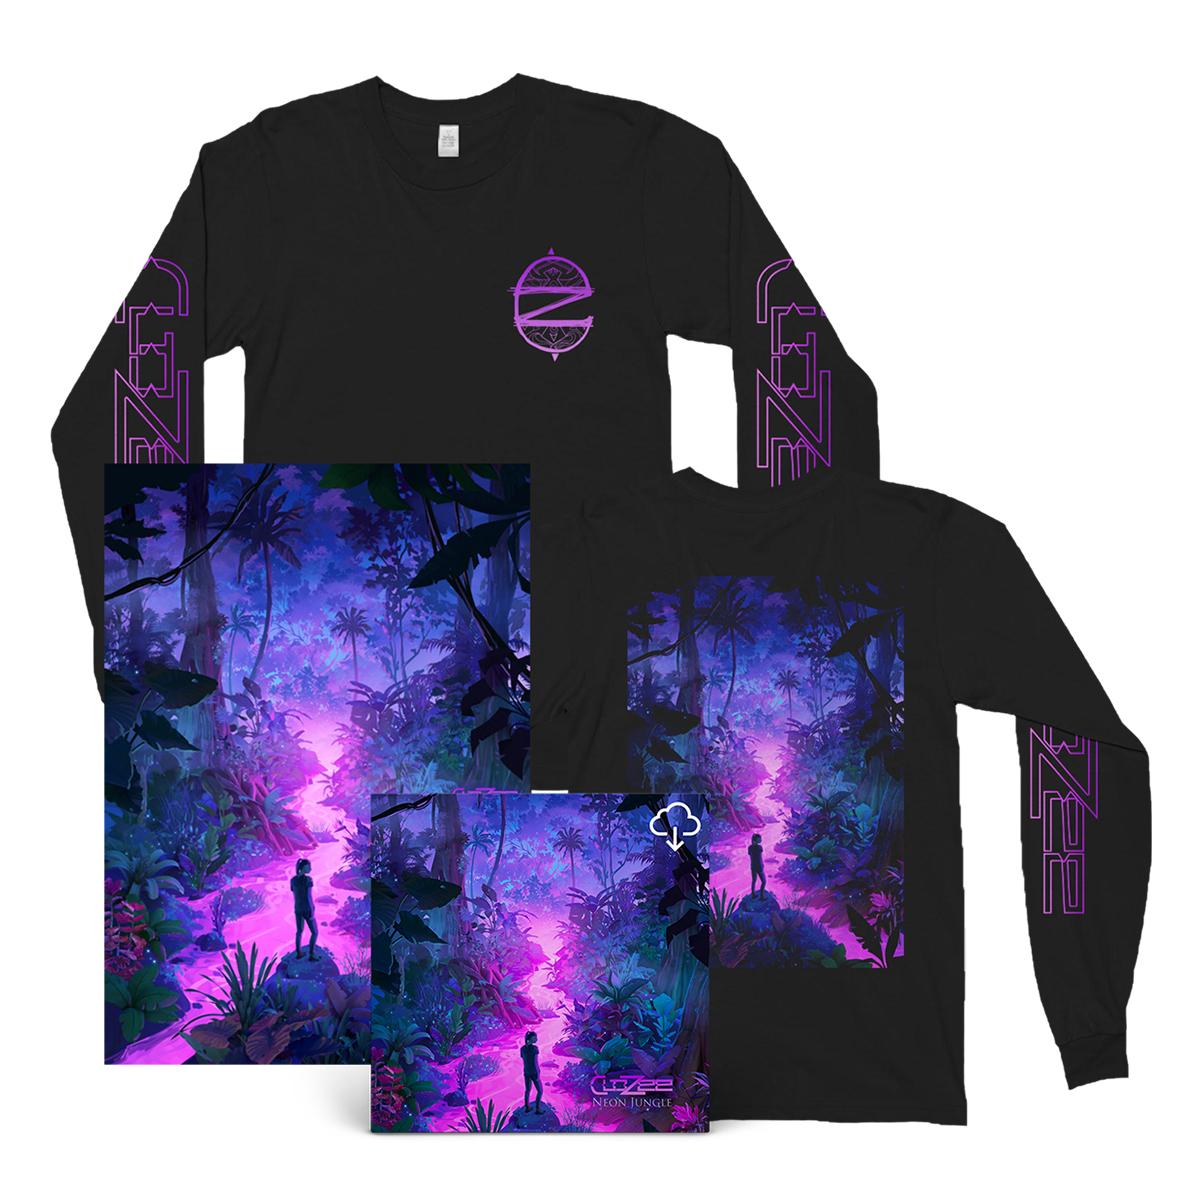 Neon Jungle Download + Long Sleeve Tee + Poster Bundle